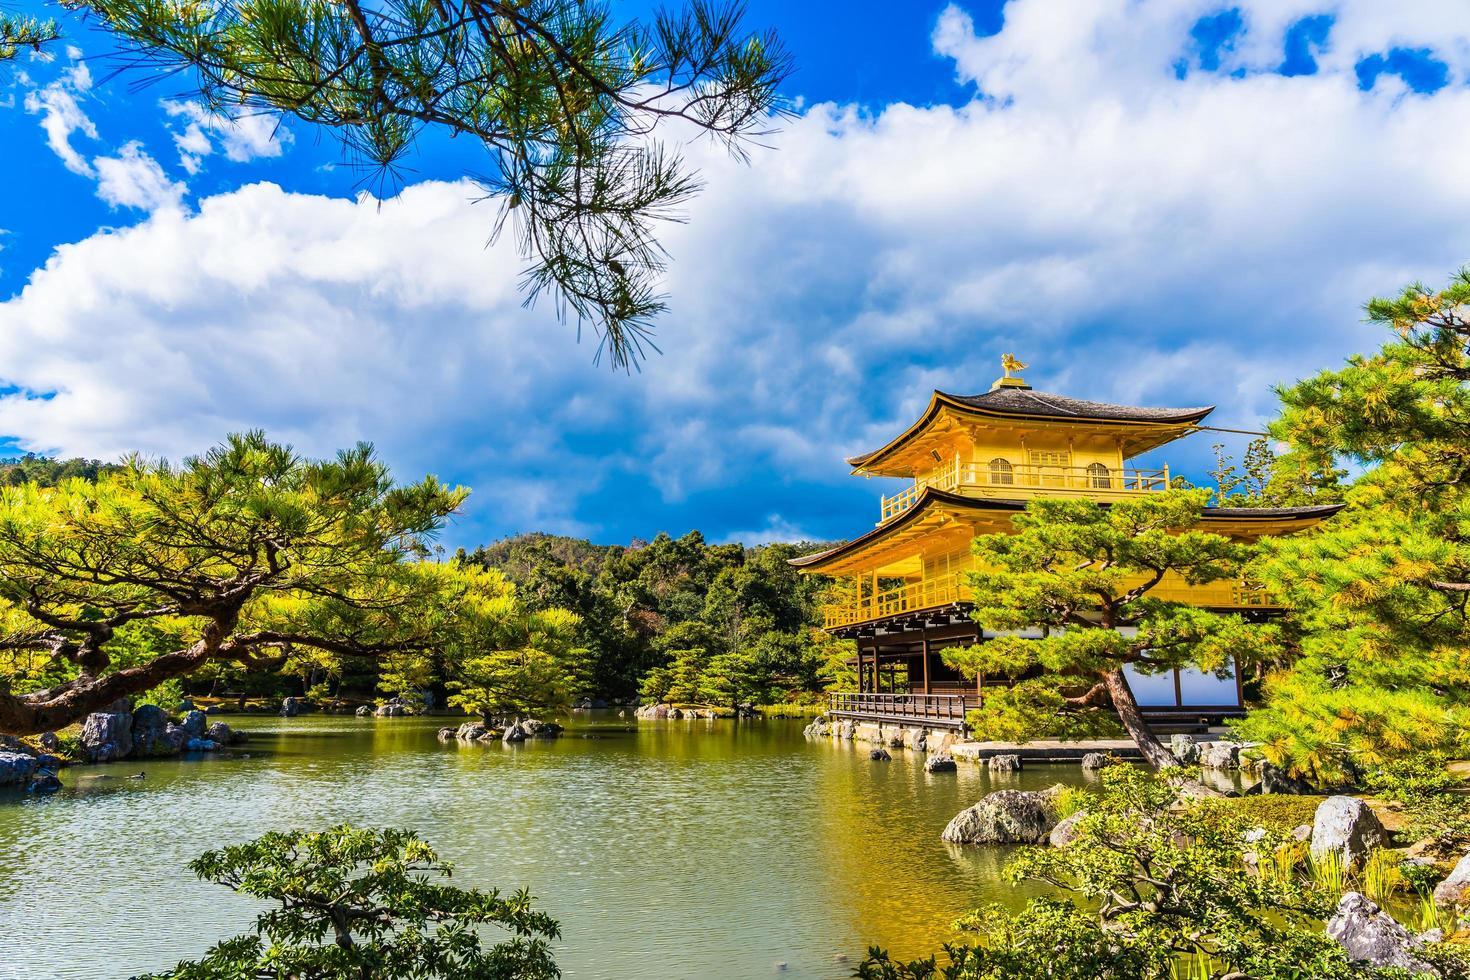 Kinkakuji temple or the Golden Pavillion in Kyoto, Japan photo